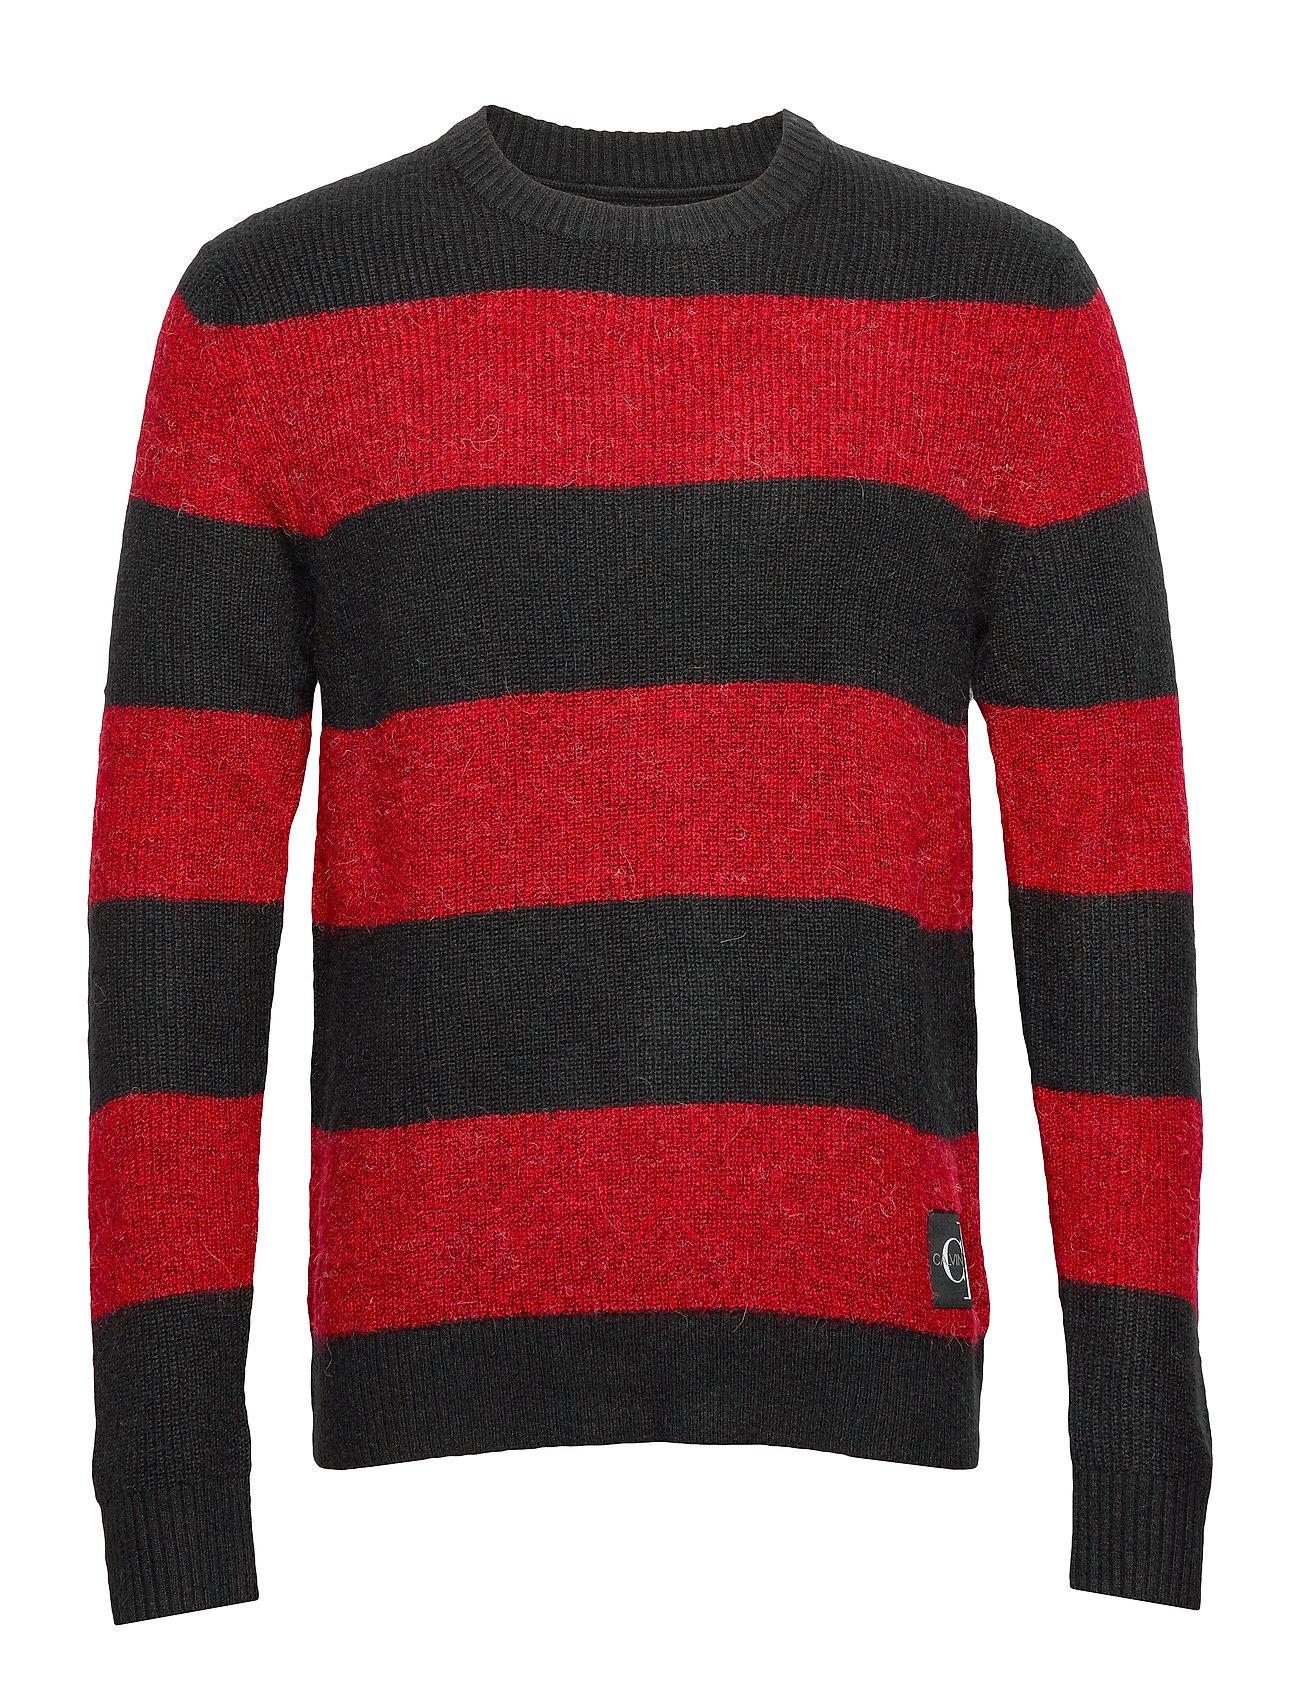 Racing Red) (£74.25) Calvin Klein